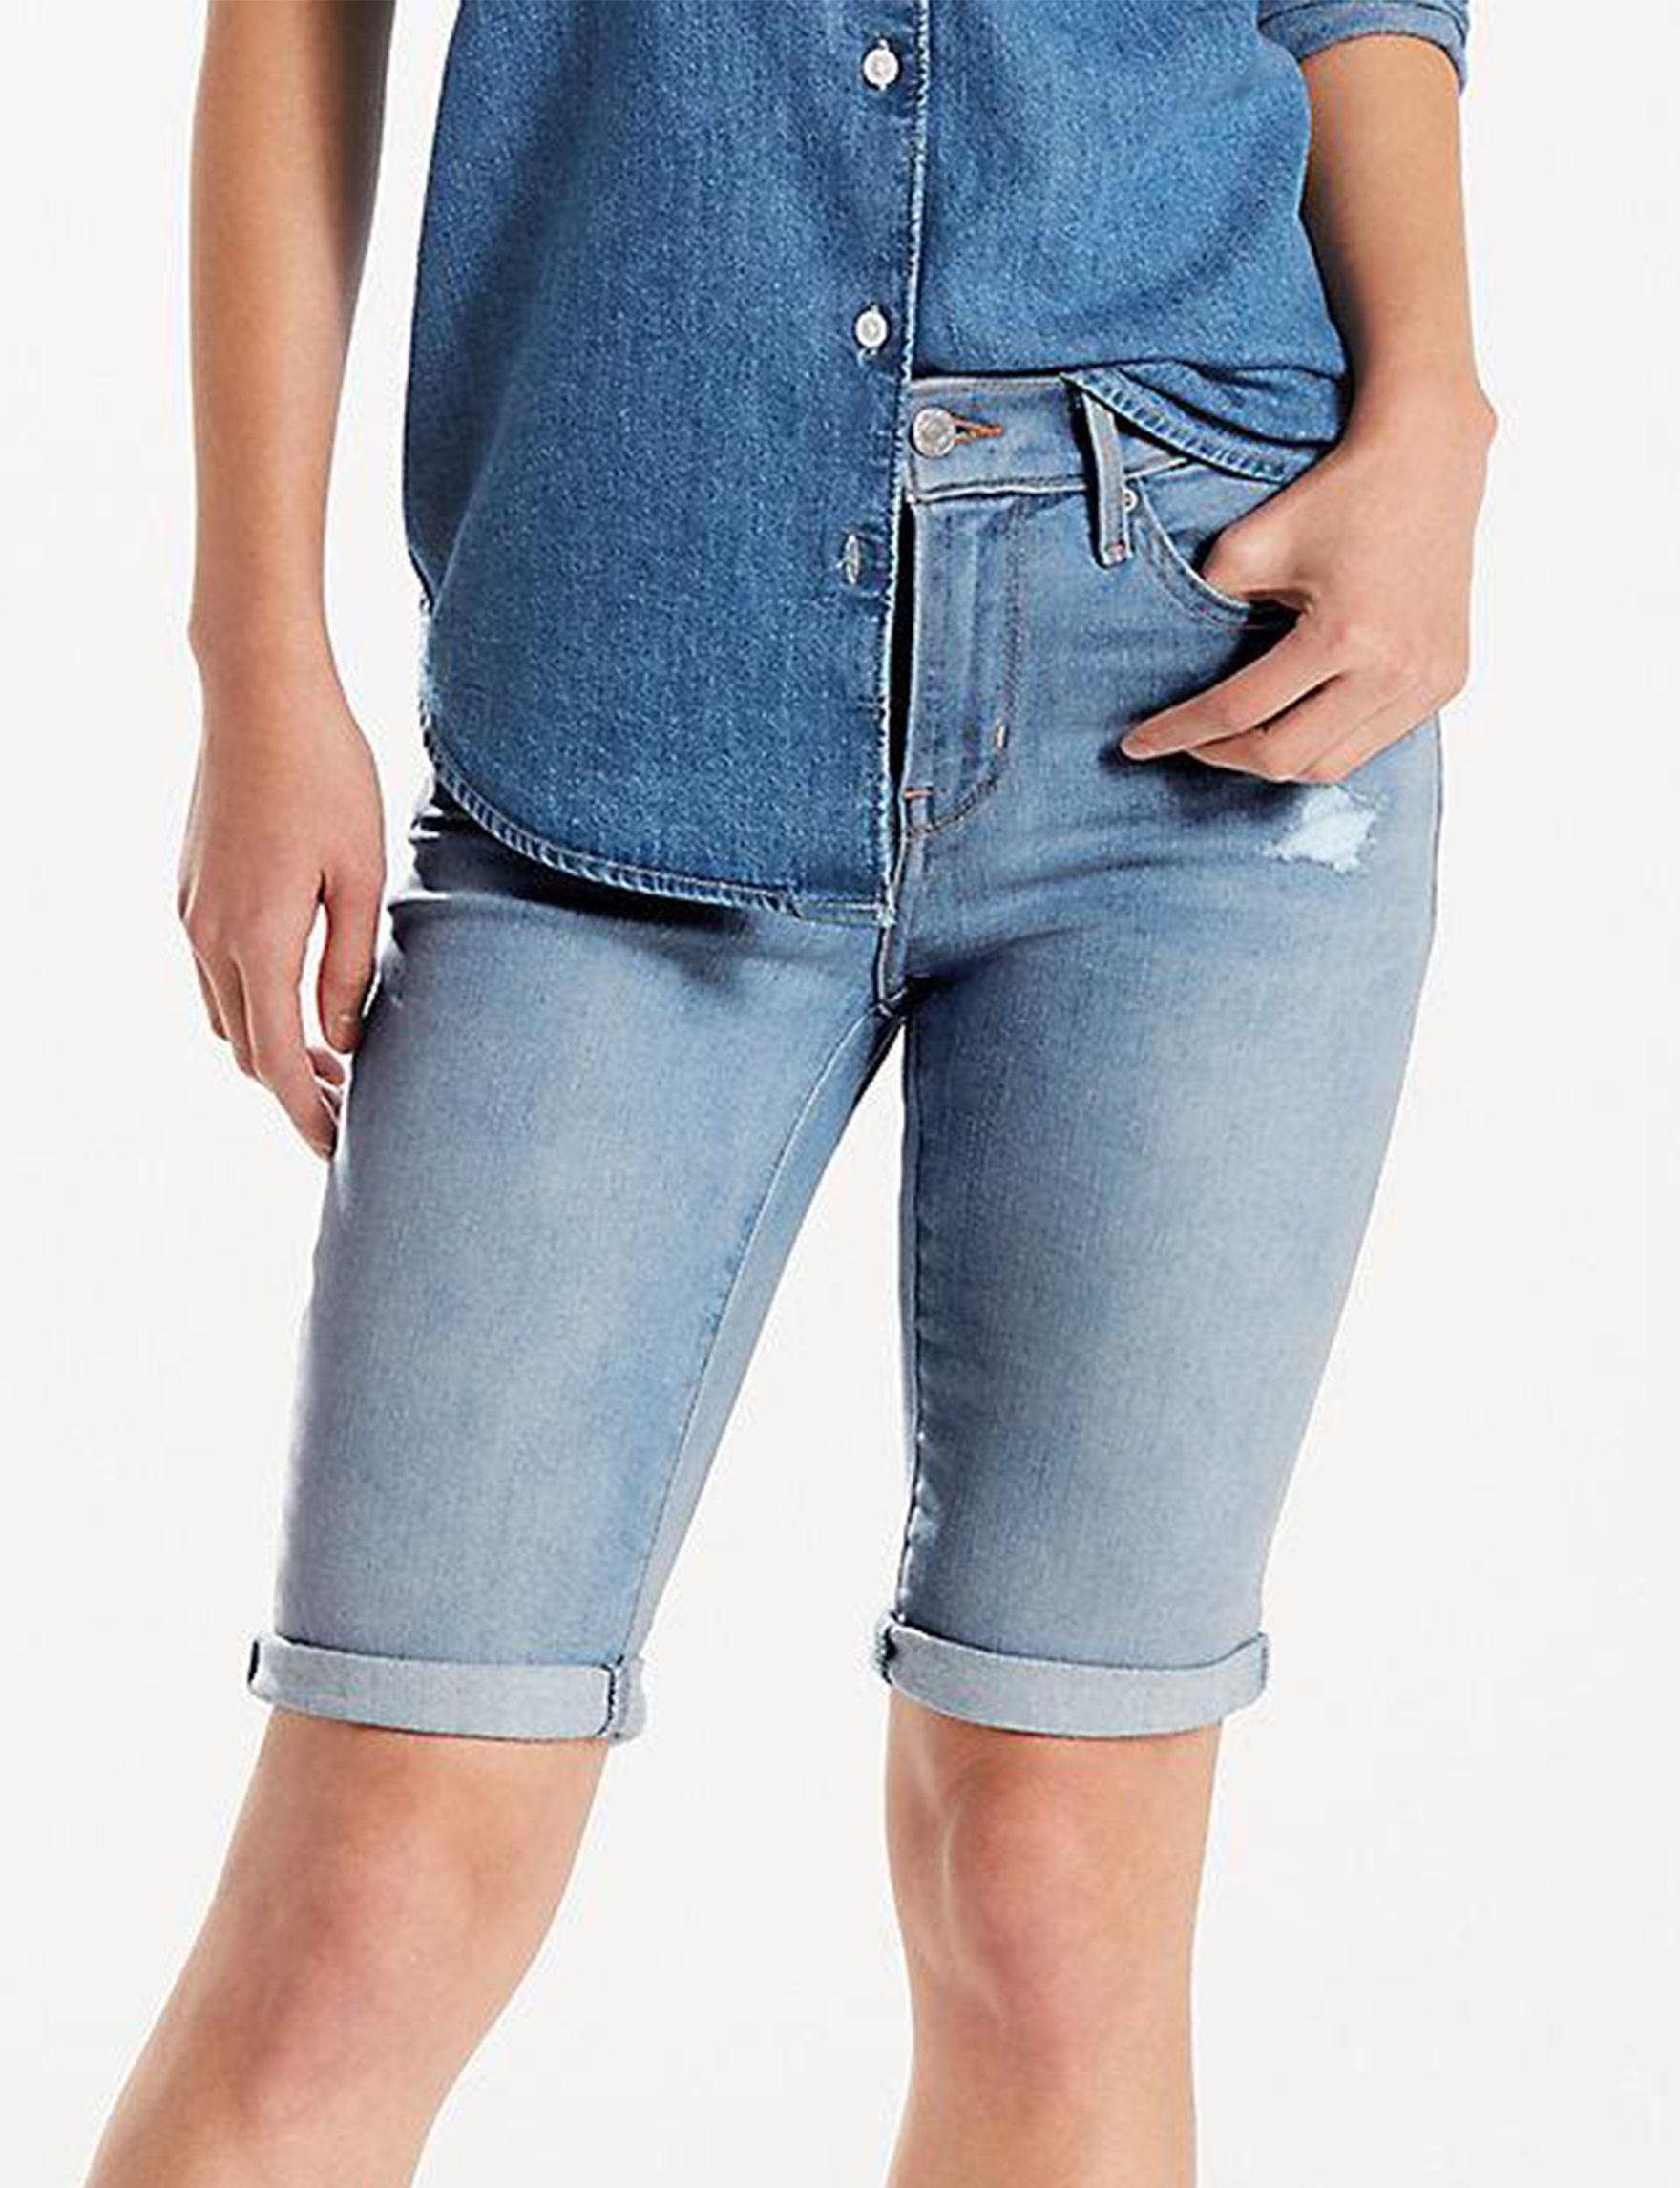 Levi's Blue Bermudas Denim Shorts